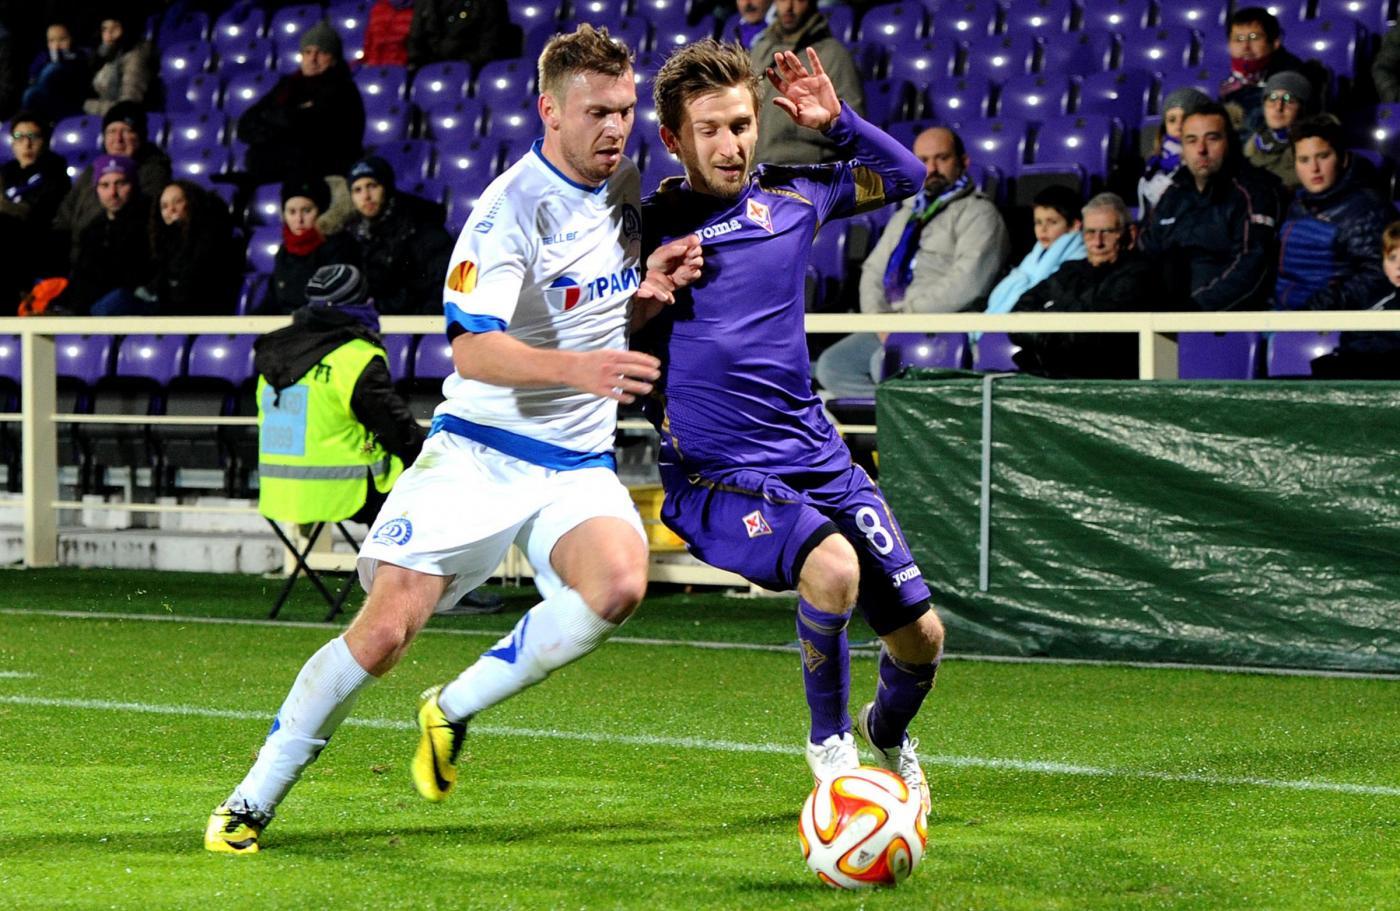 Fiorentina Dinamo Kiev 150x150